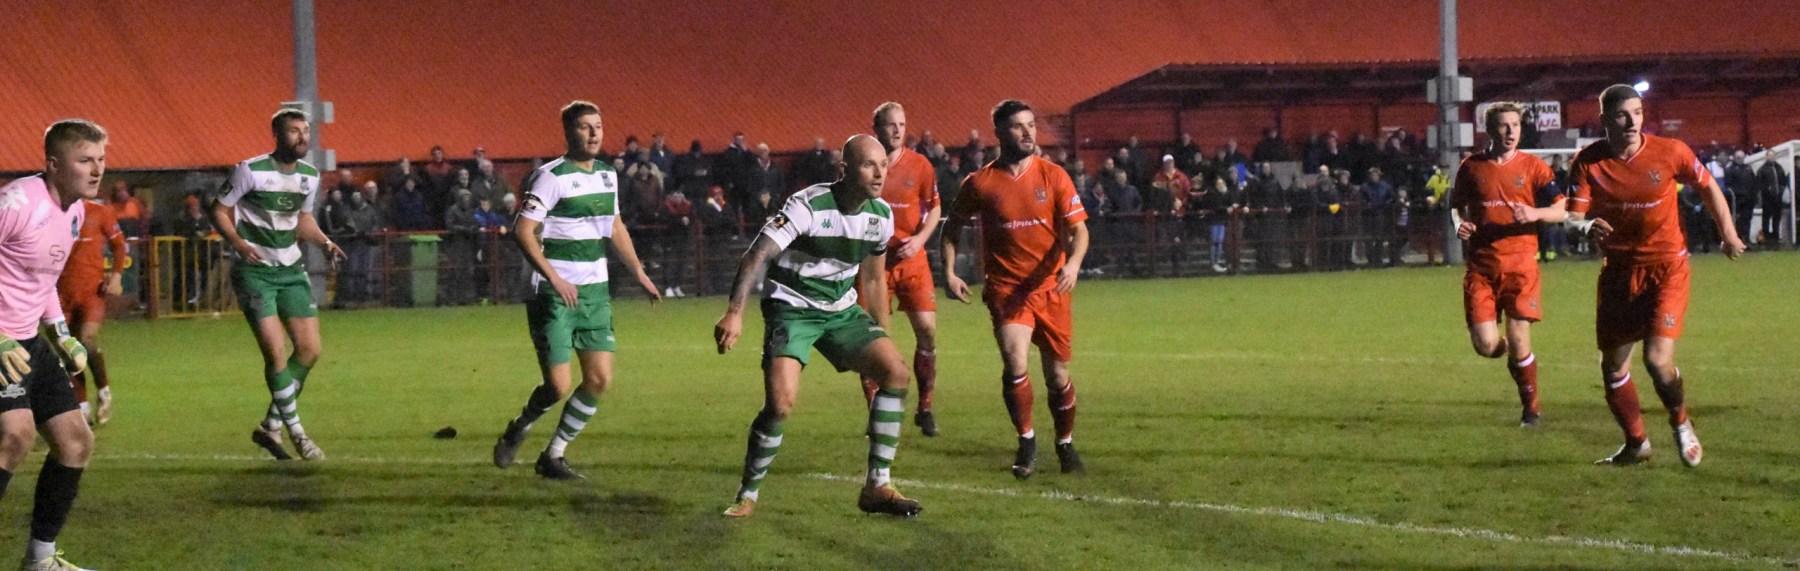 Workington-Reds-v-Farsley-Celtic-Ben-Challis-21-scaled